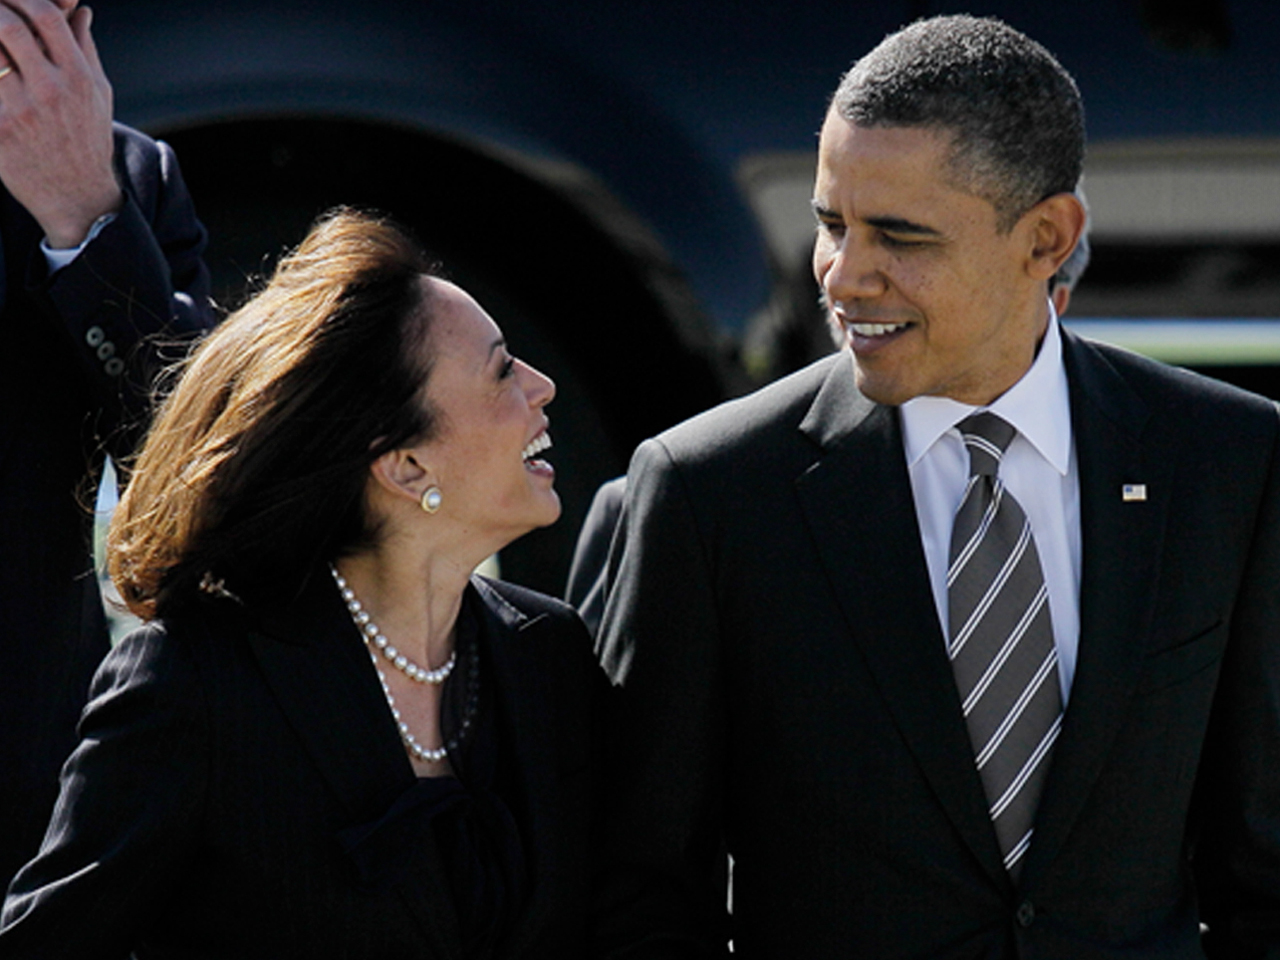 Obama Apologizes To Kamala Harris For Best Looking